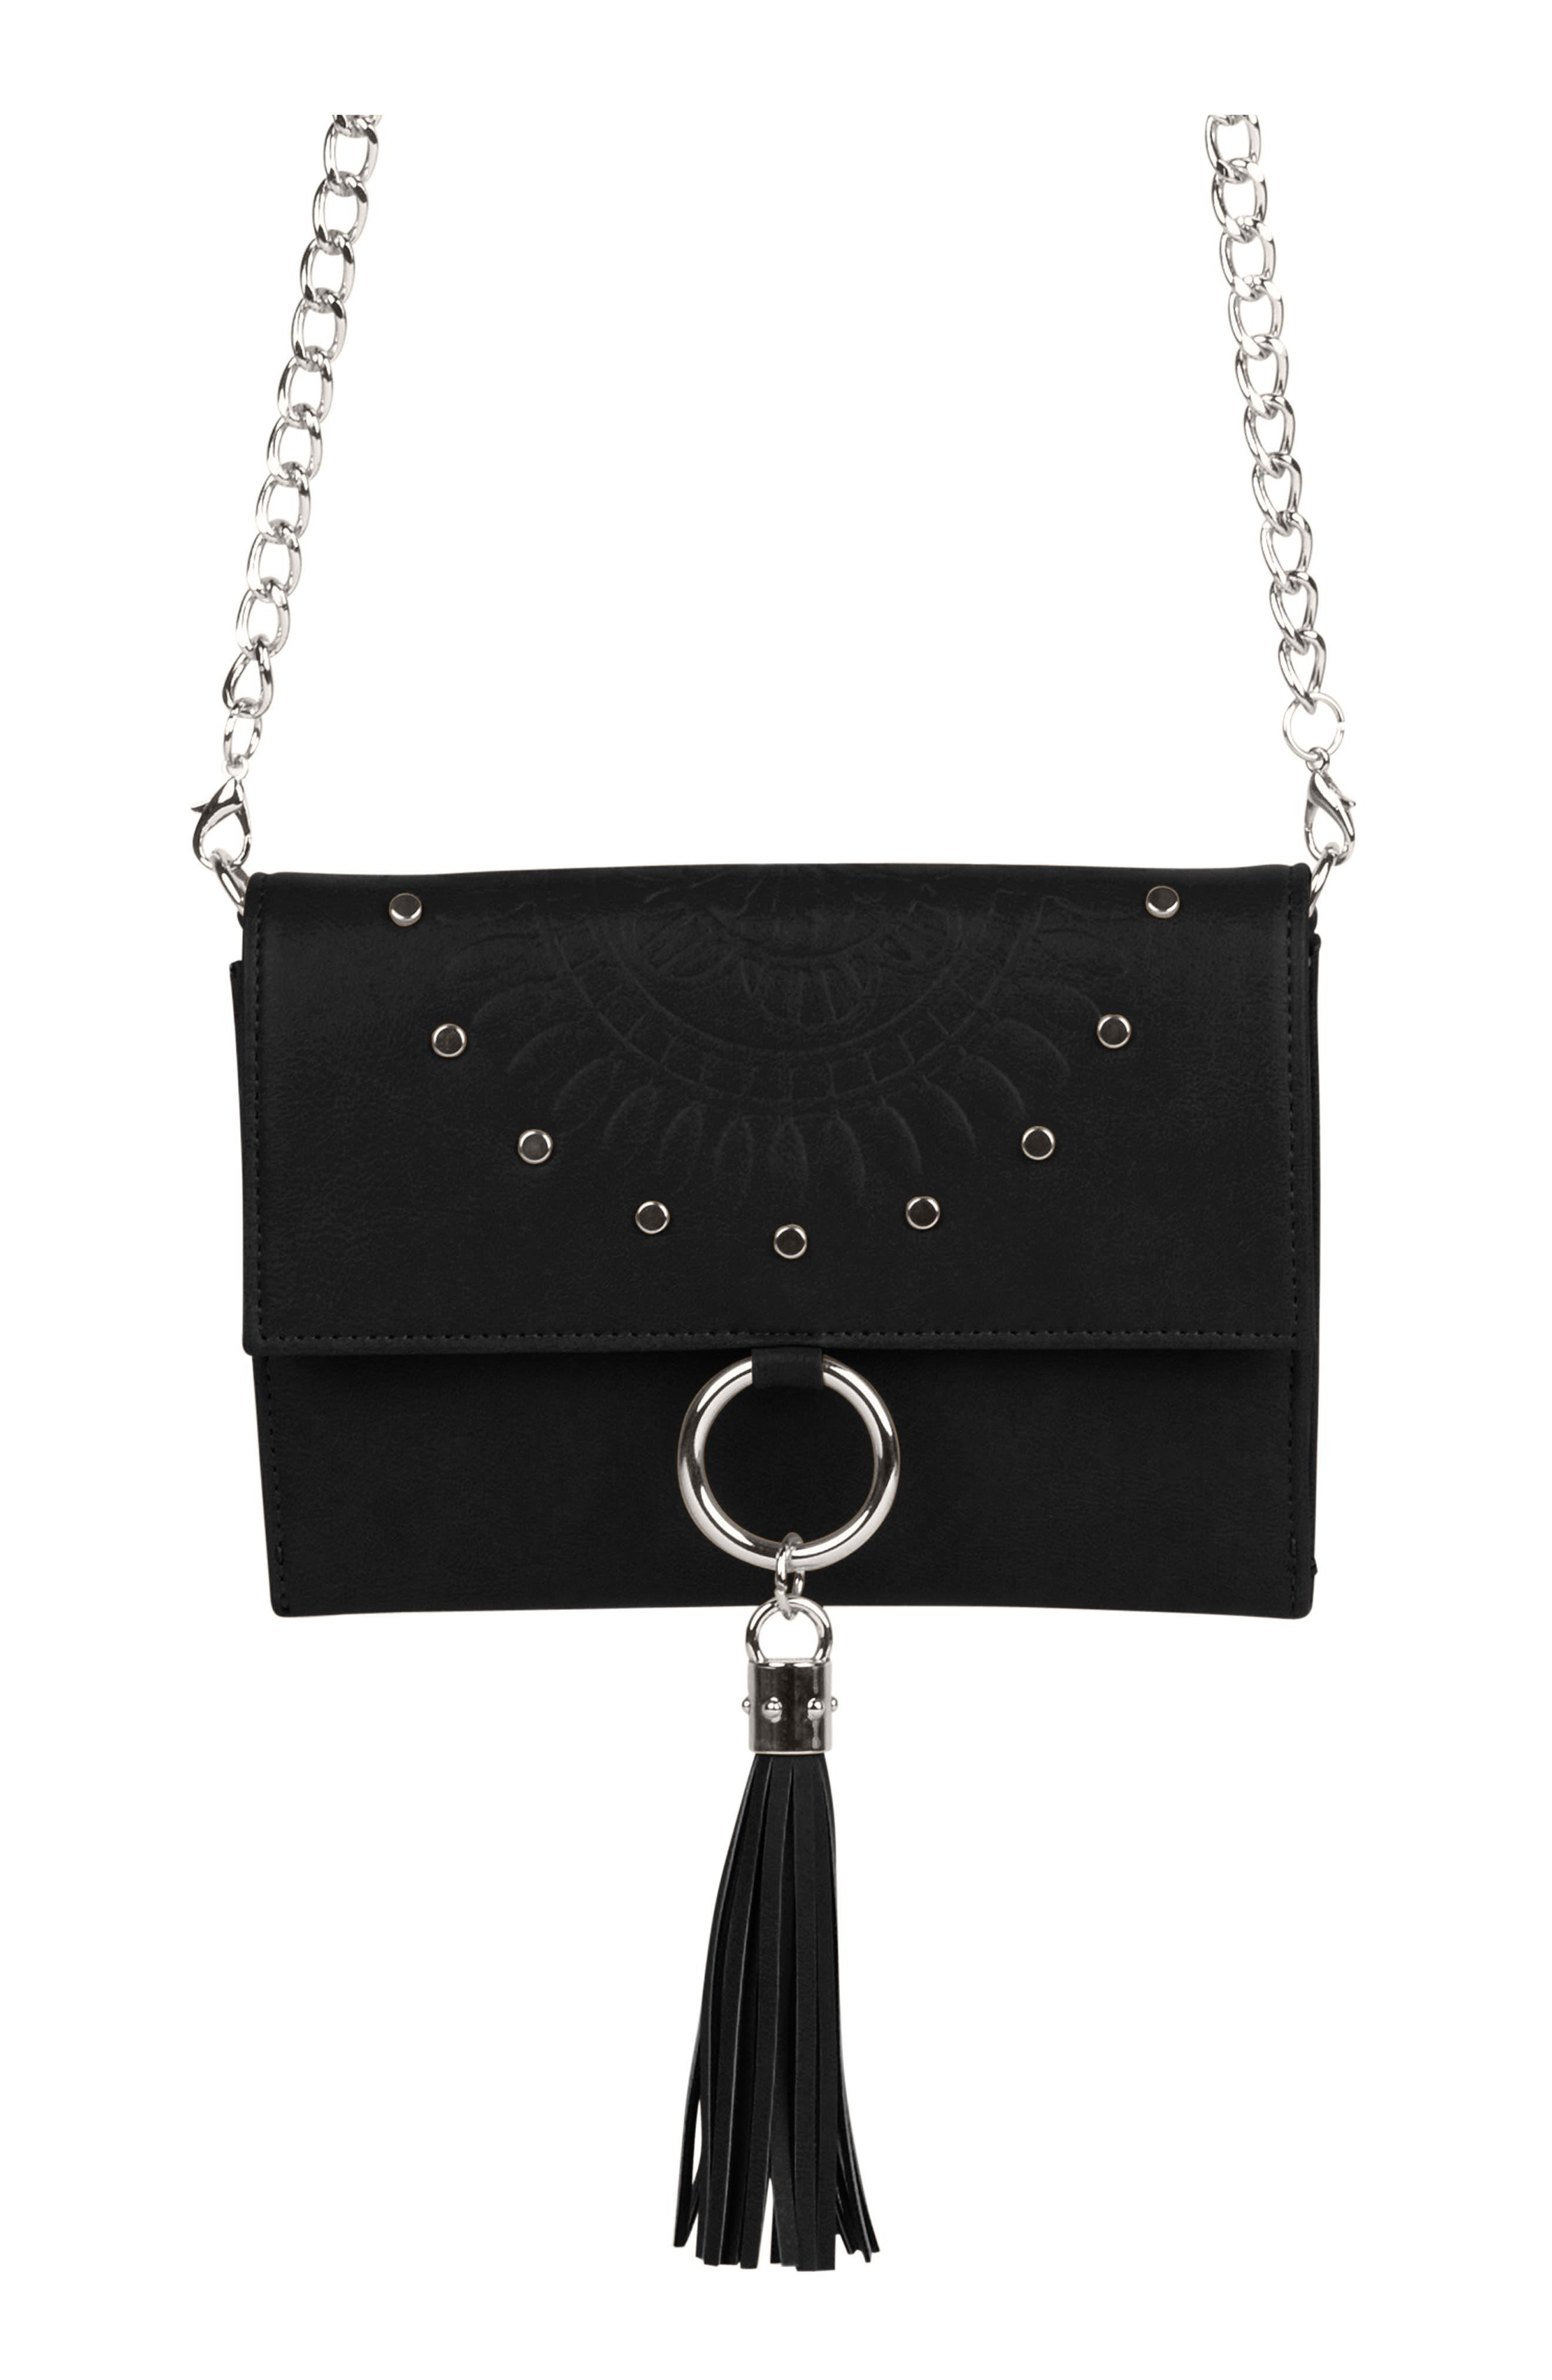 First Love Vegan Leather Crossbody Bag - Black